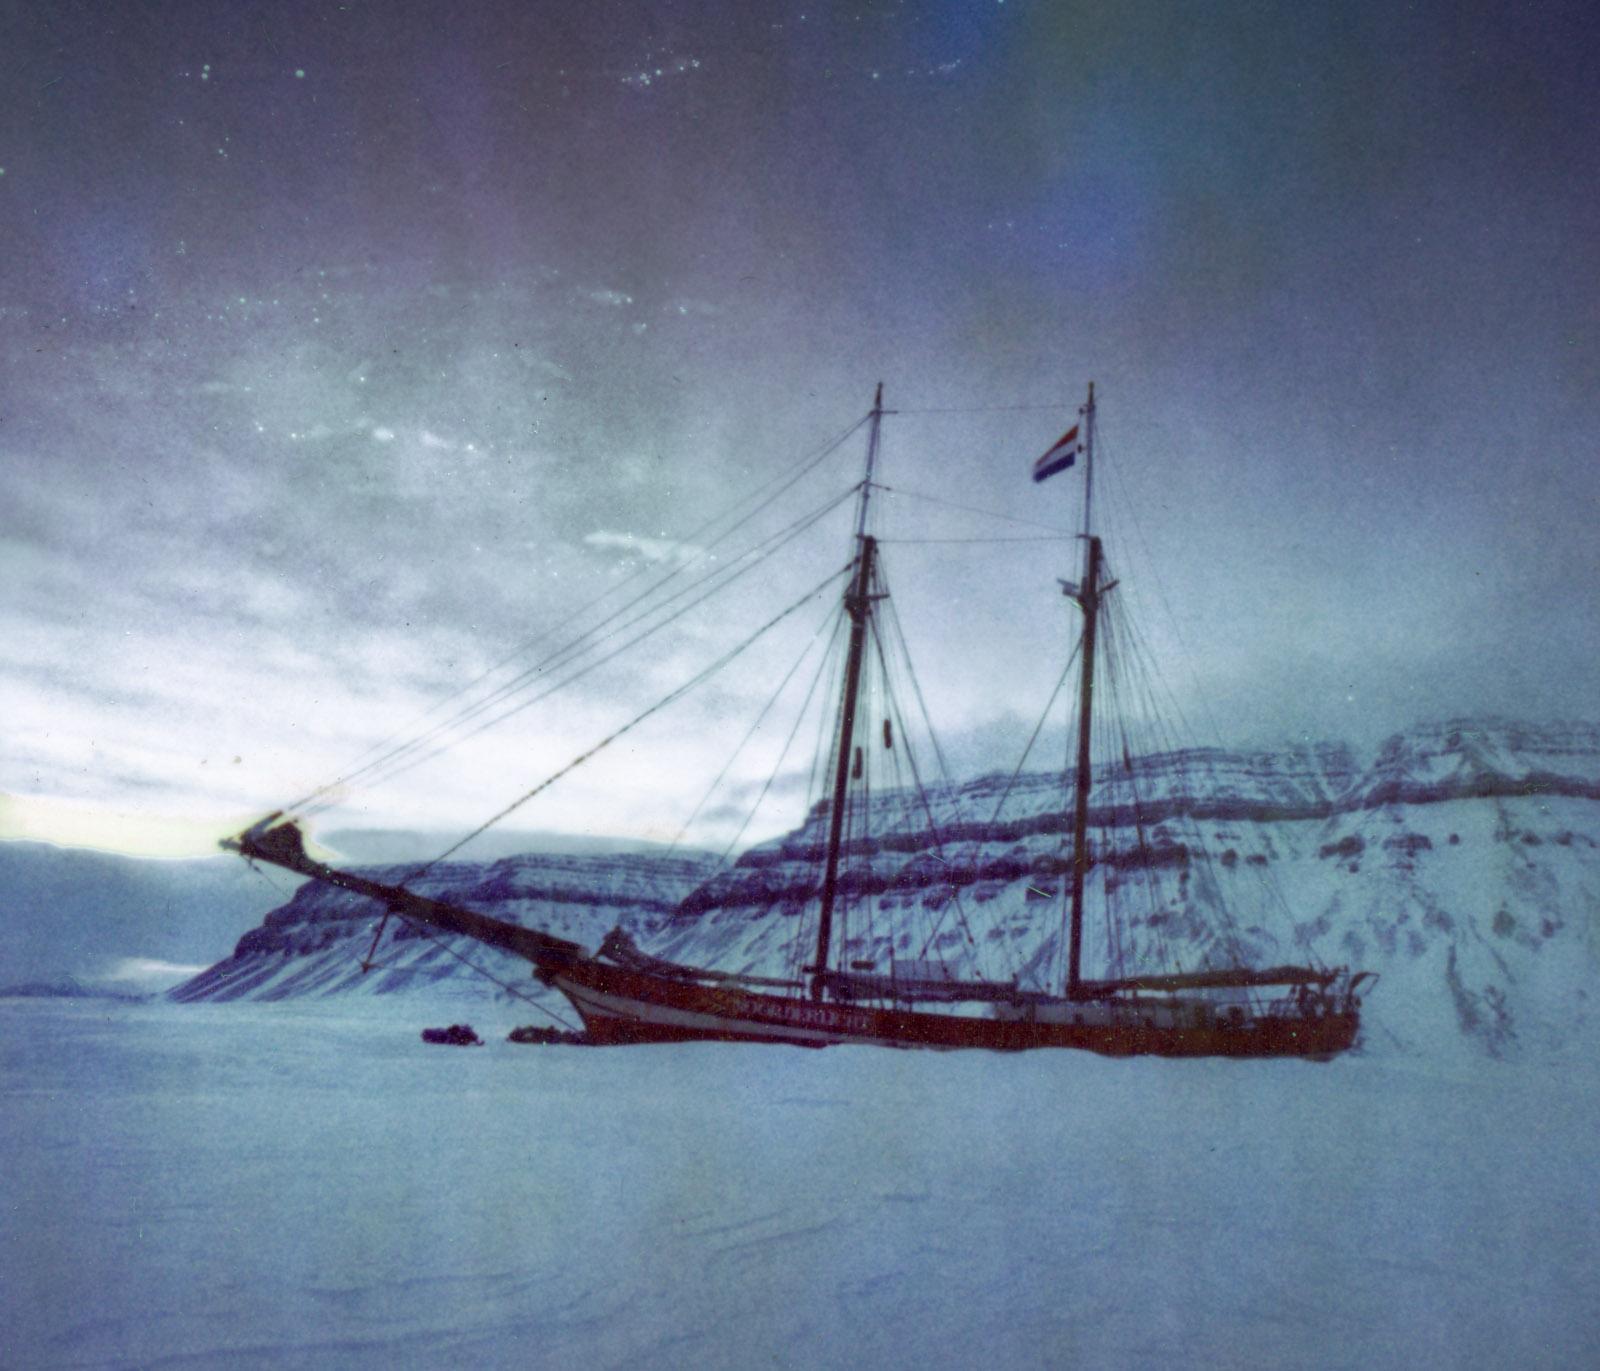 Reuben_Wu_Photography_Svalbard-20-of-22